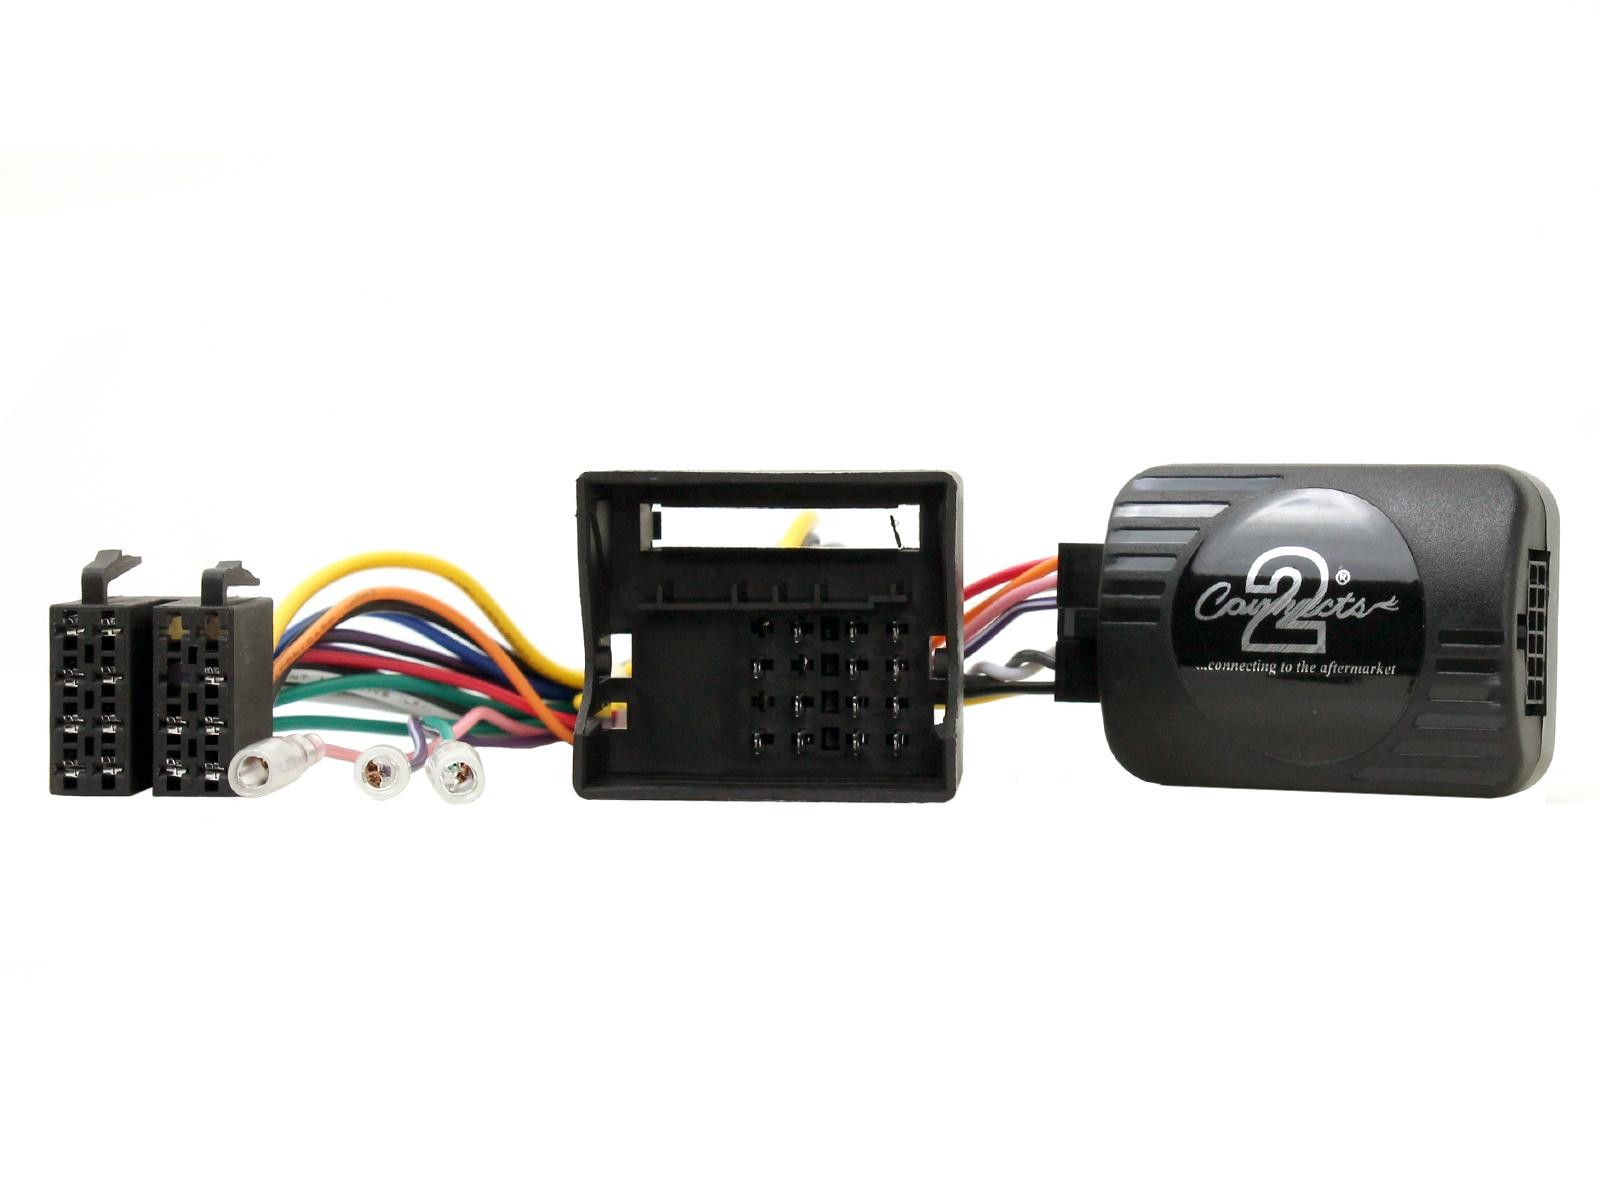 Interface Mandos Seat Ctsst001 Audiocar